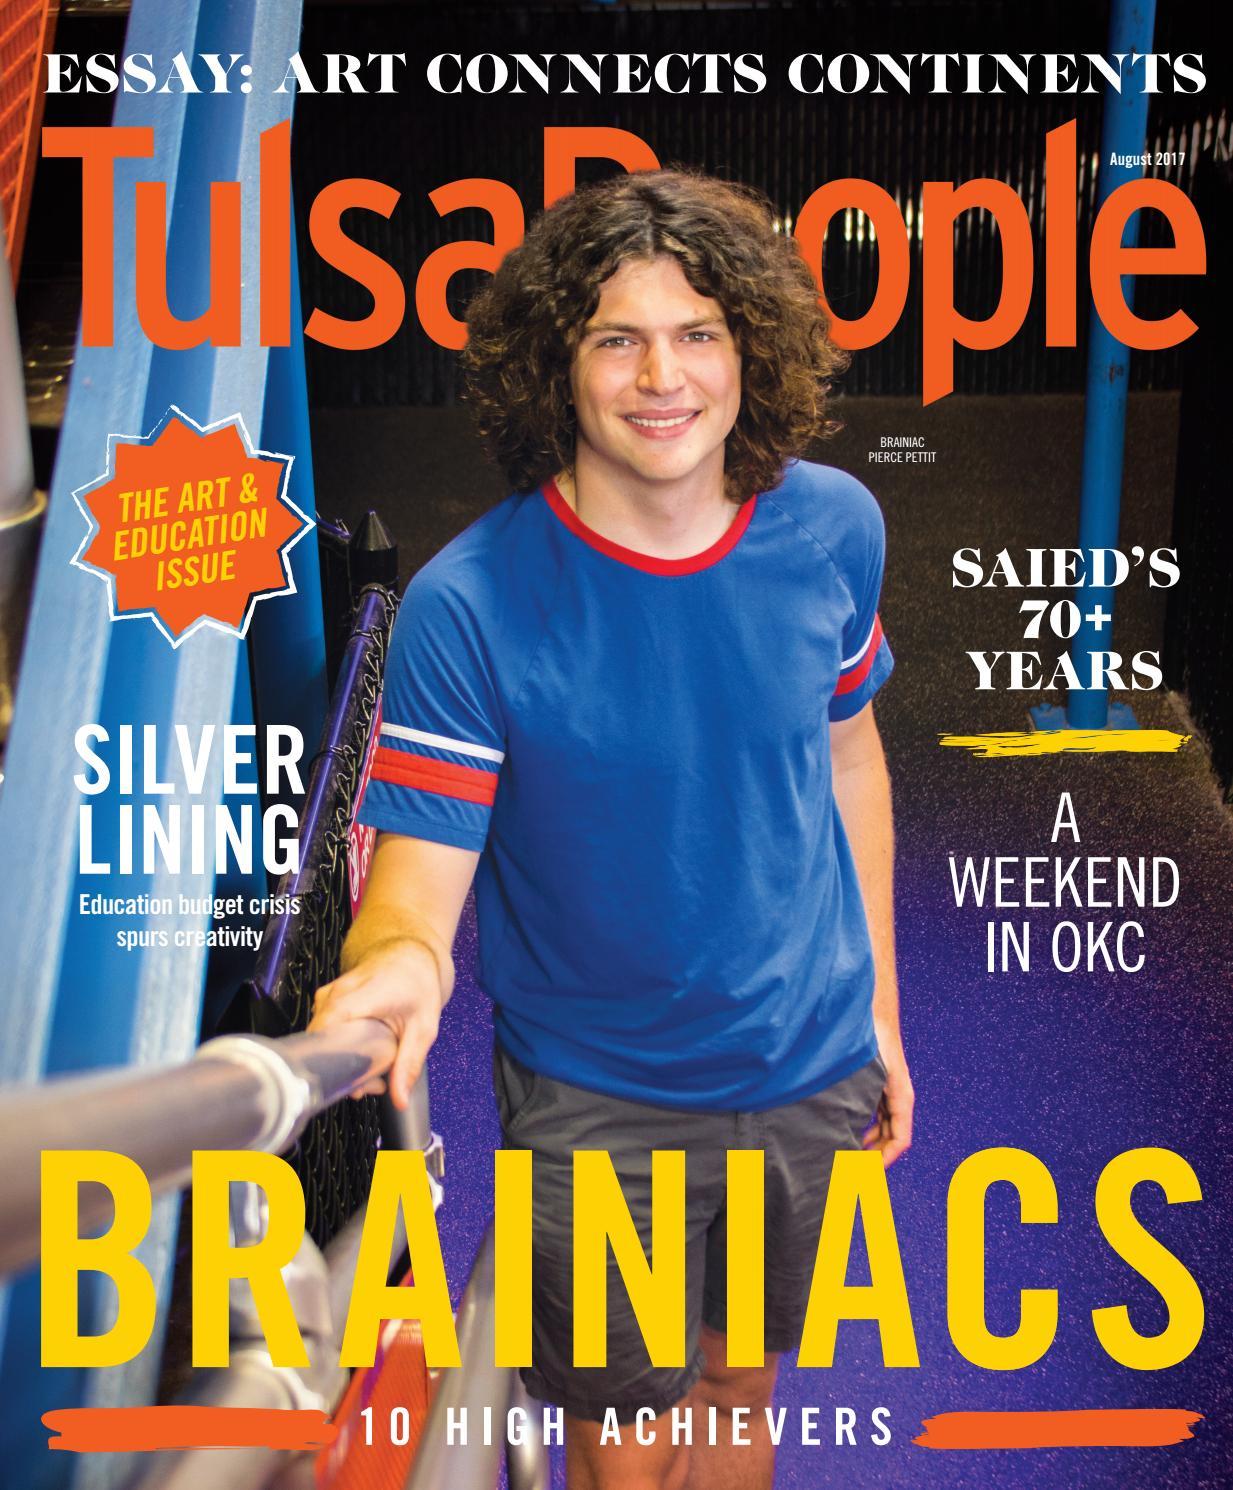 Tulsapeople August 2017 By Tulsapeople Issuu